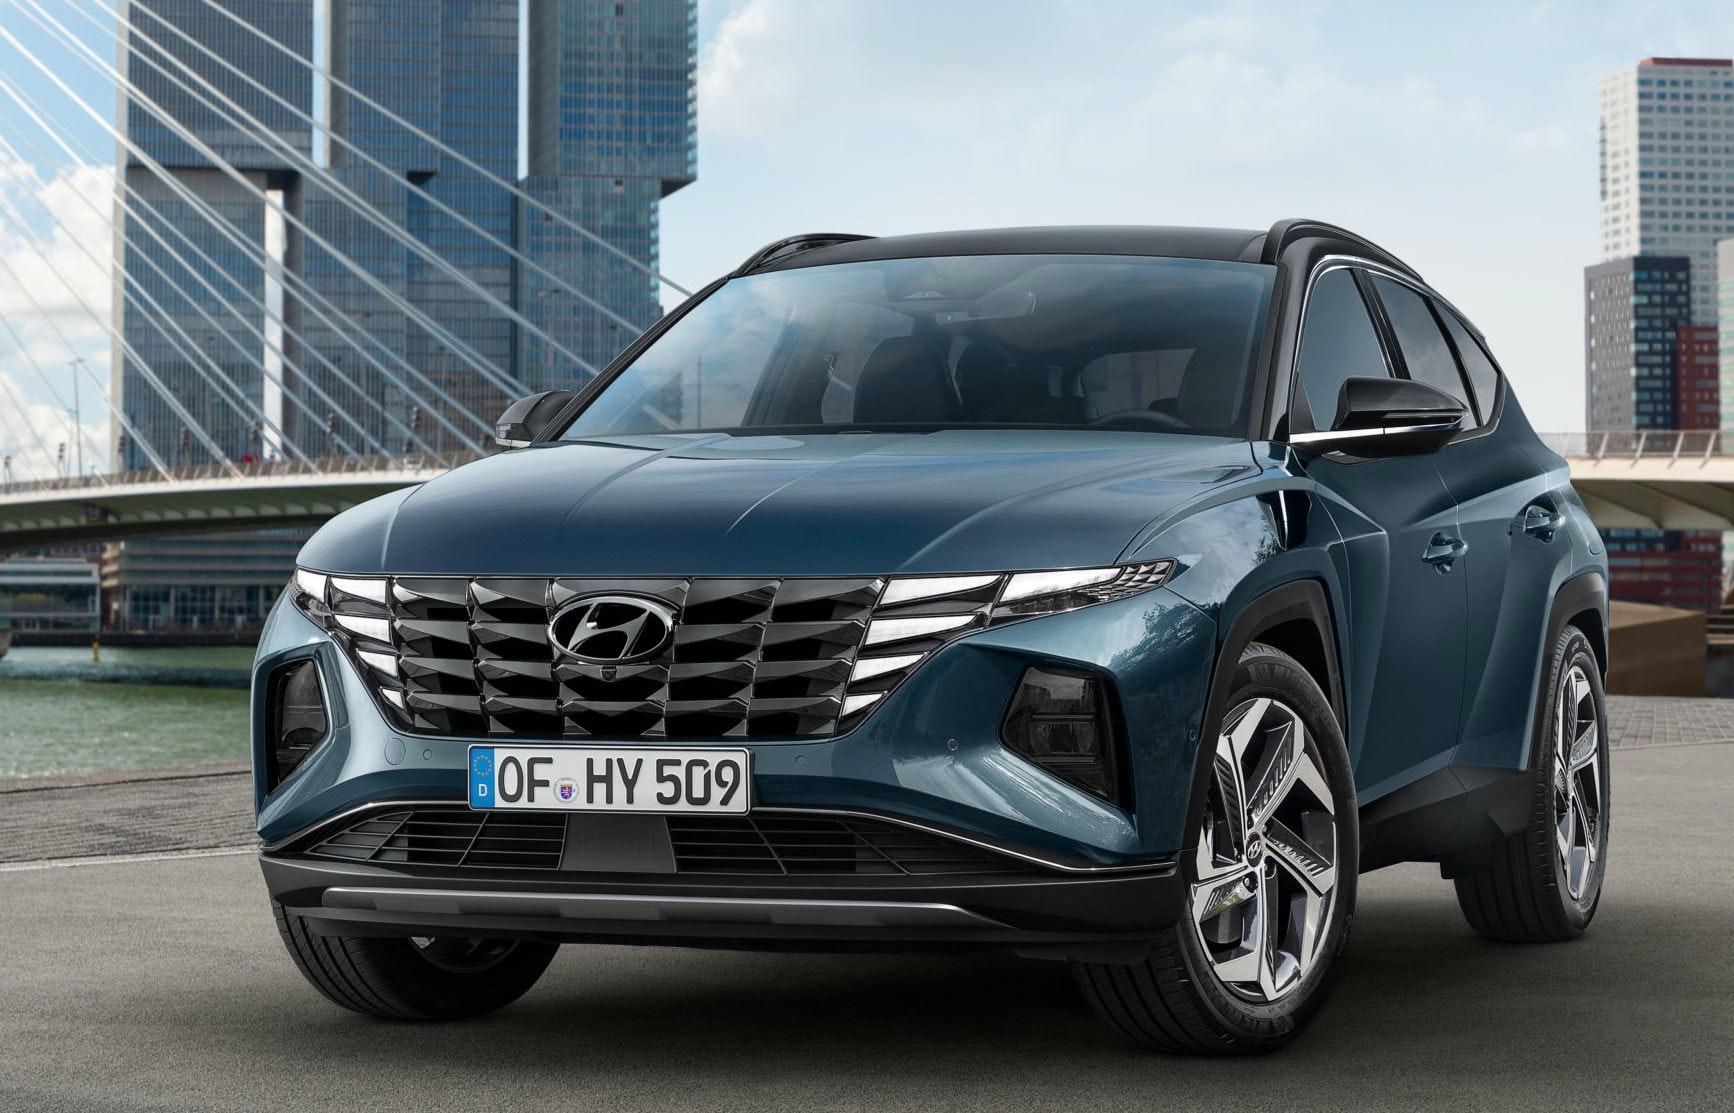 Hyundai Tucson 2021 Preise Technische Daten Verkaufsstart Carwow De